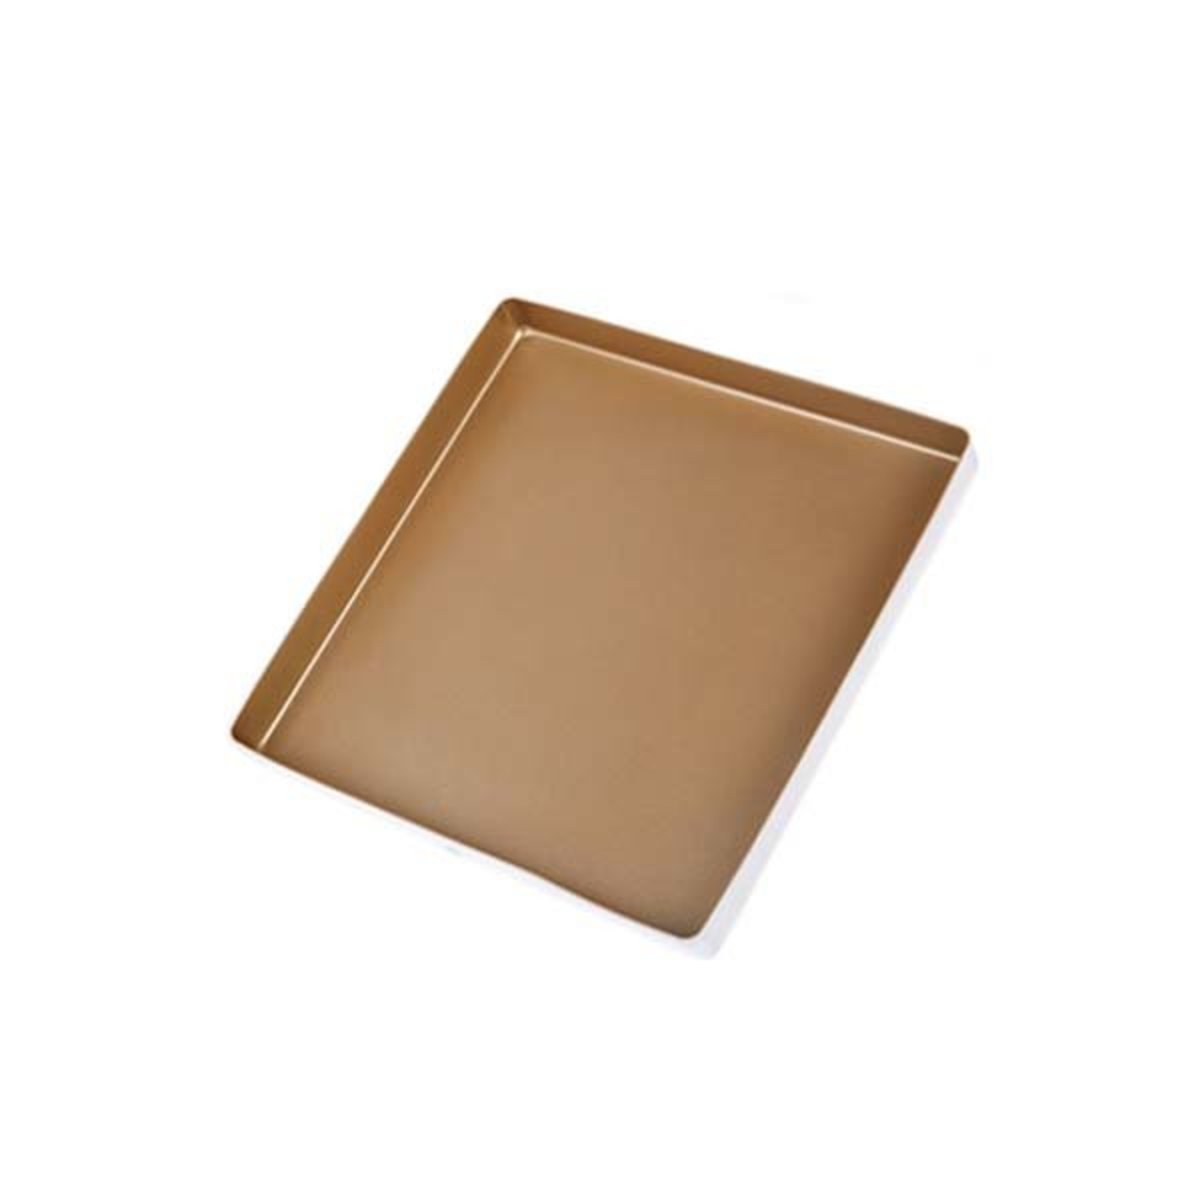 Unopan - Square Baking Sheet (Aluminum Alloy)